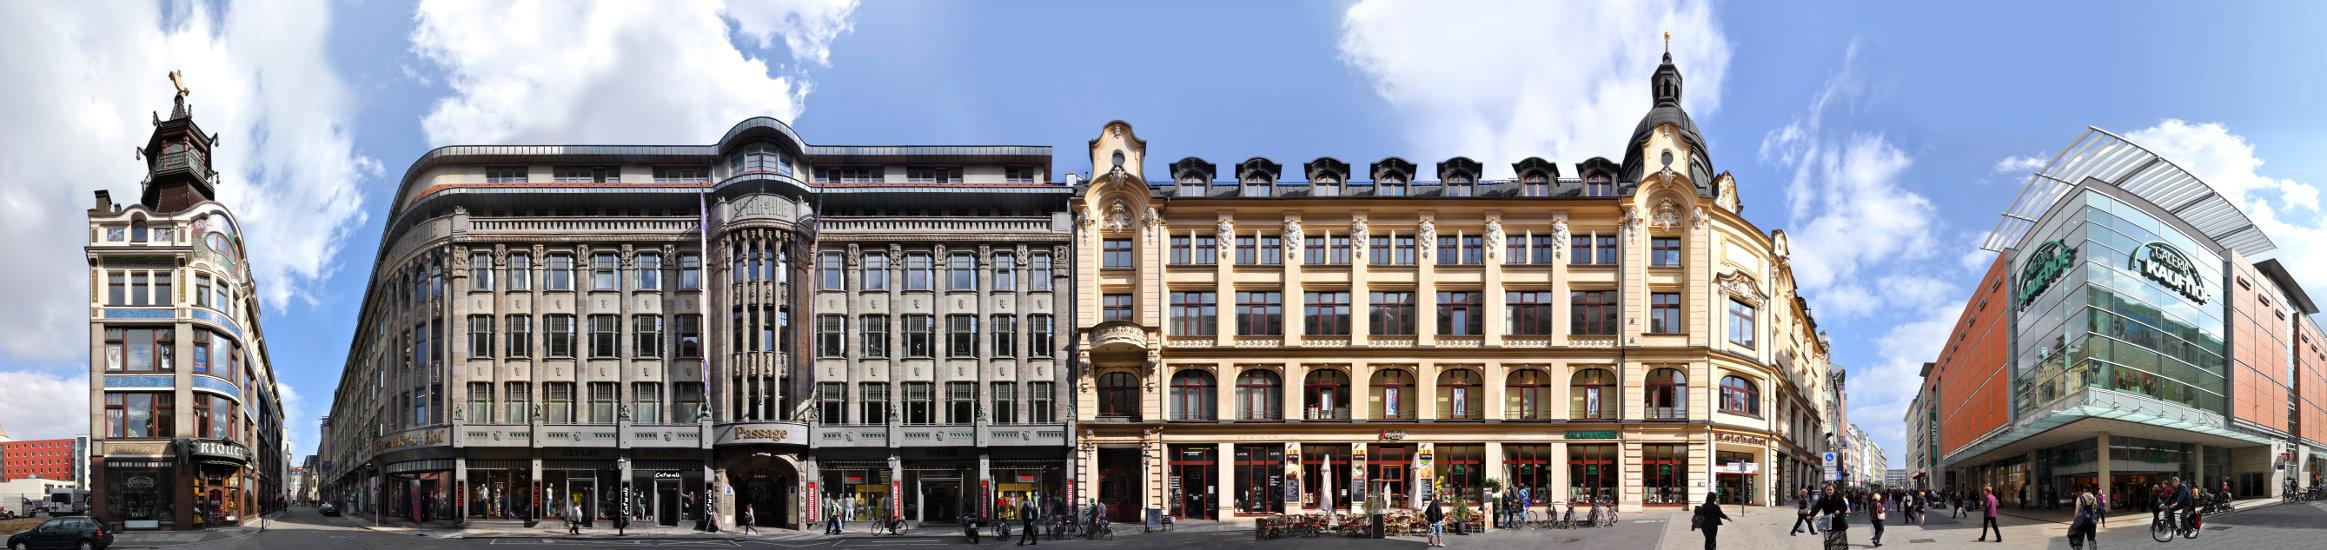 Reichsstrasse • Leipzig • Germany